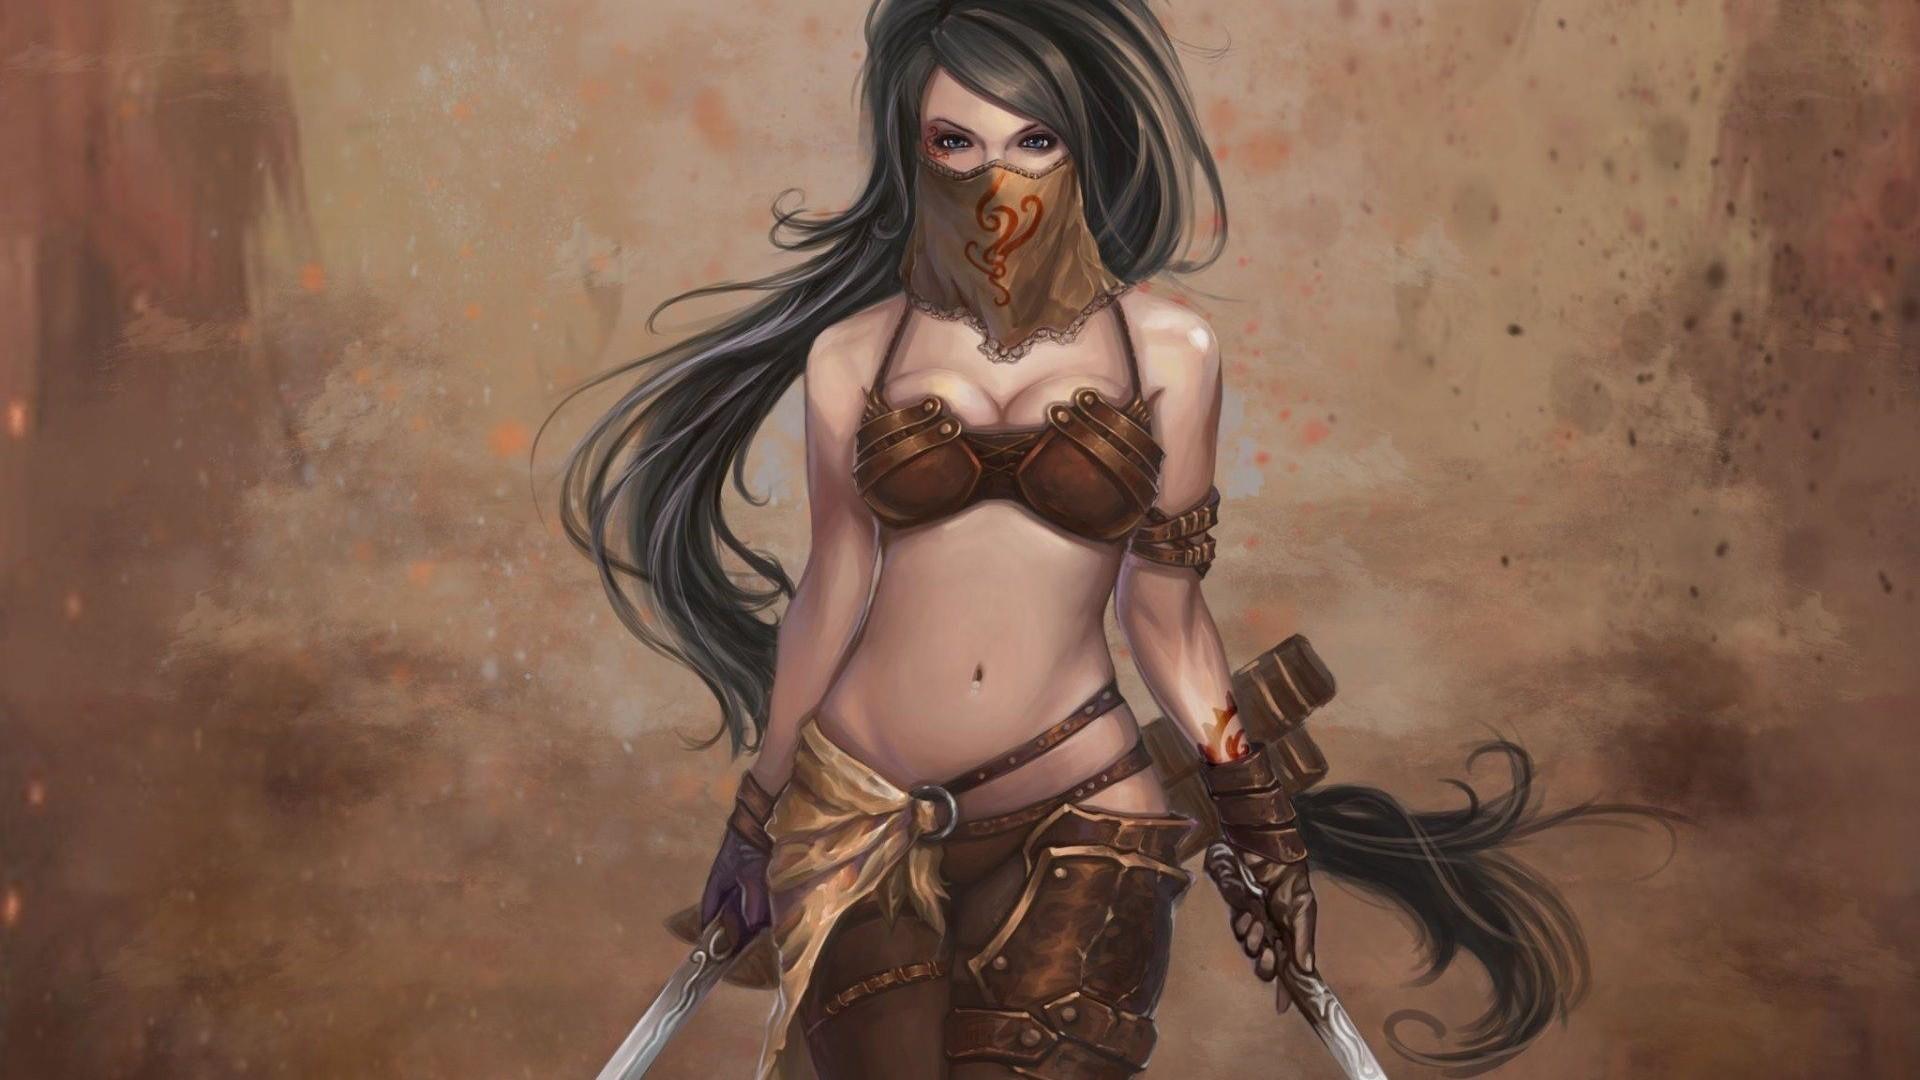 woman warrior. Art ID: 85772